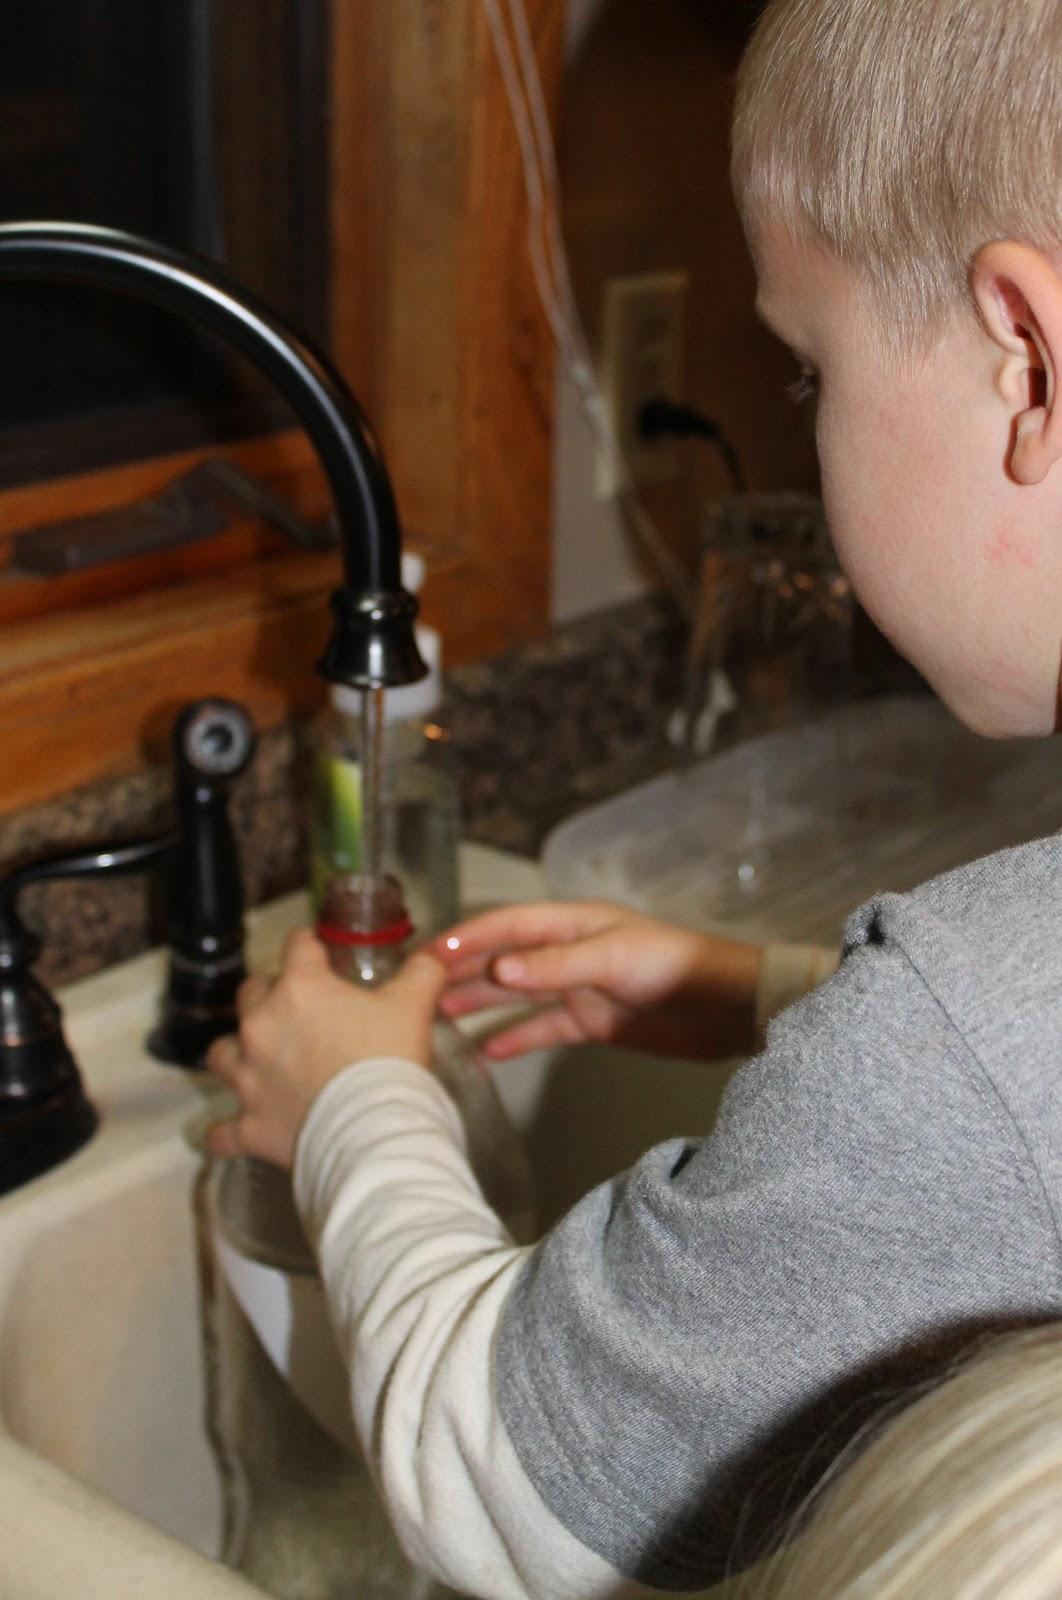 How To Make A Tornado Kids Science Experiment